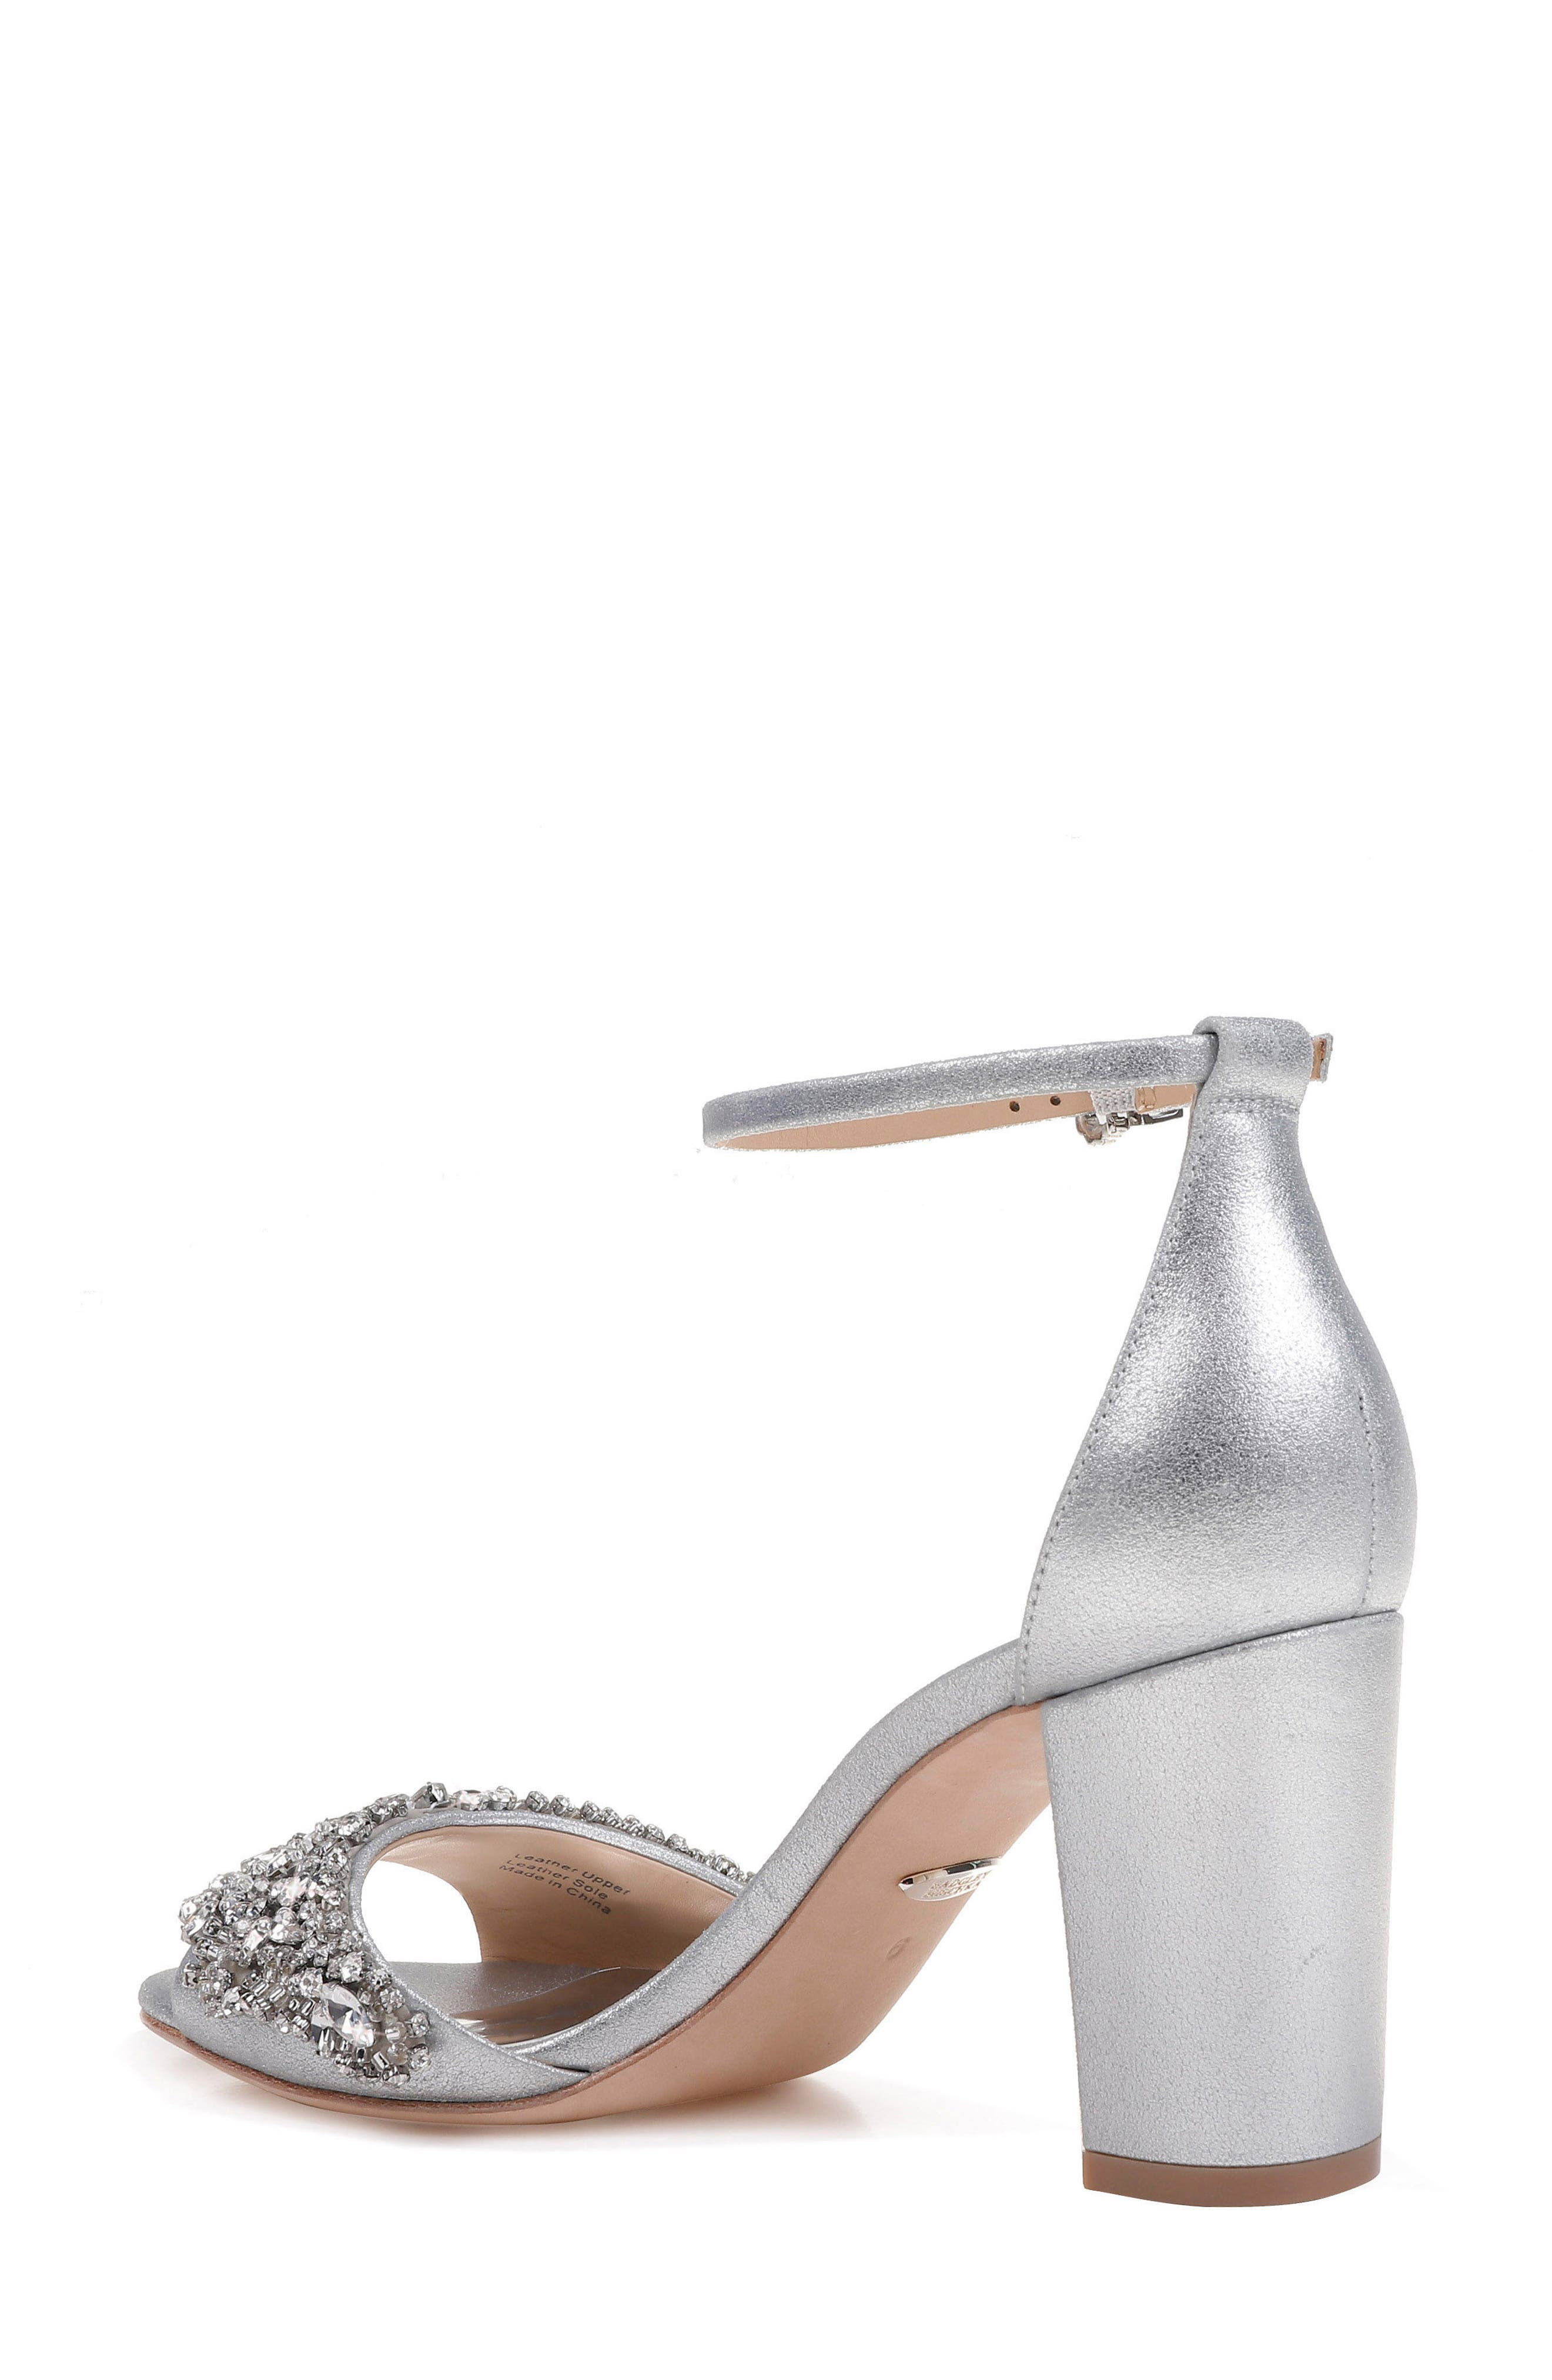 Hines Embellished Block Heel Sandal,                             Alternate thumbnail 7, color,